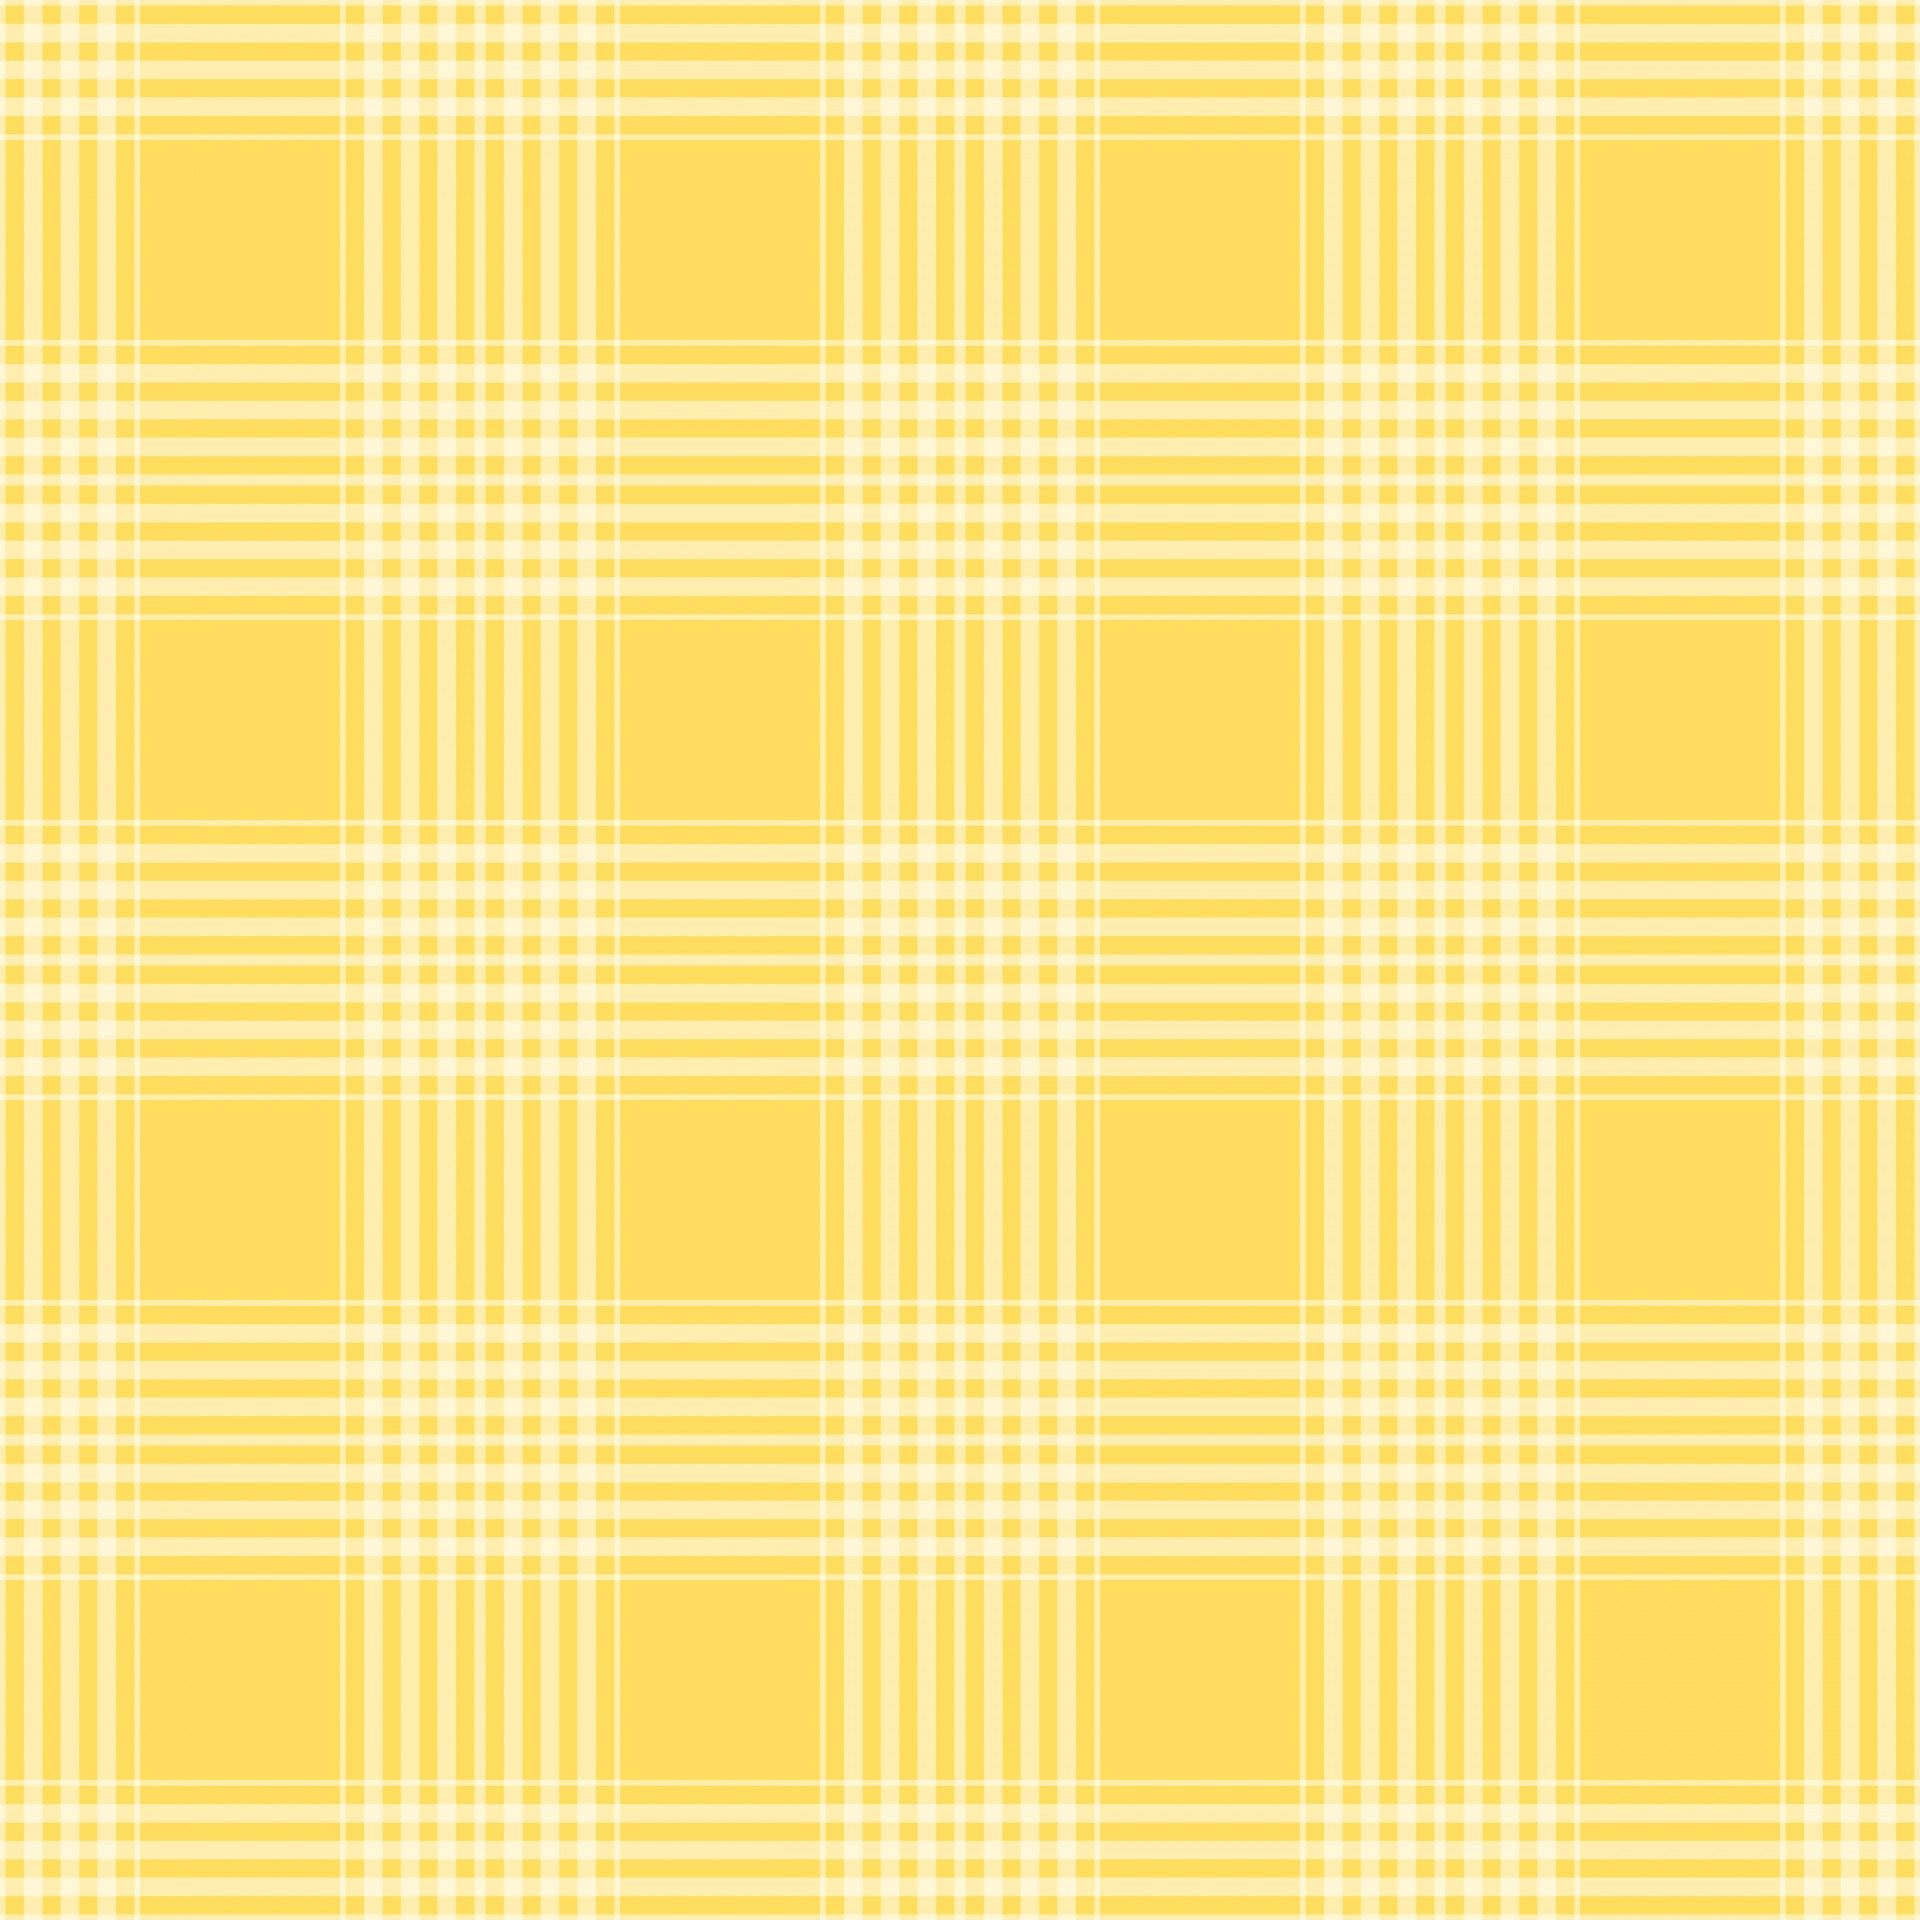 Yellow Plaid Wallpapers on WallpaperDog